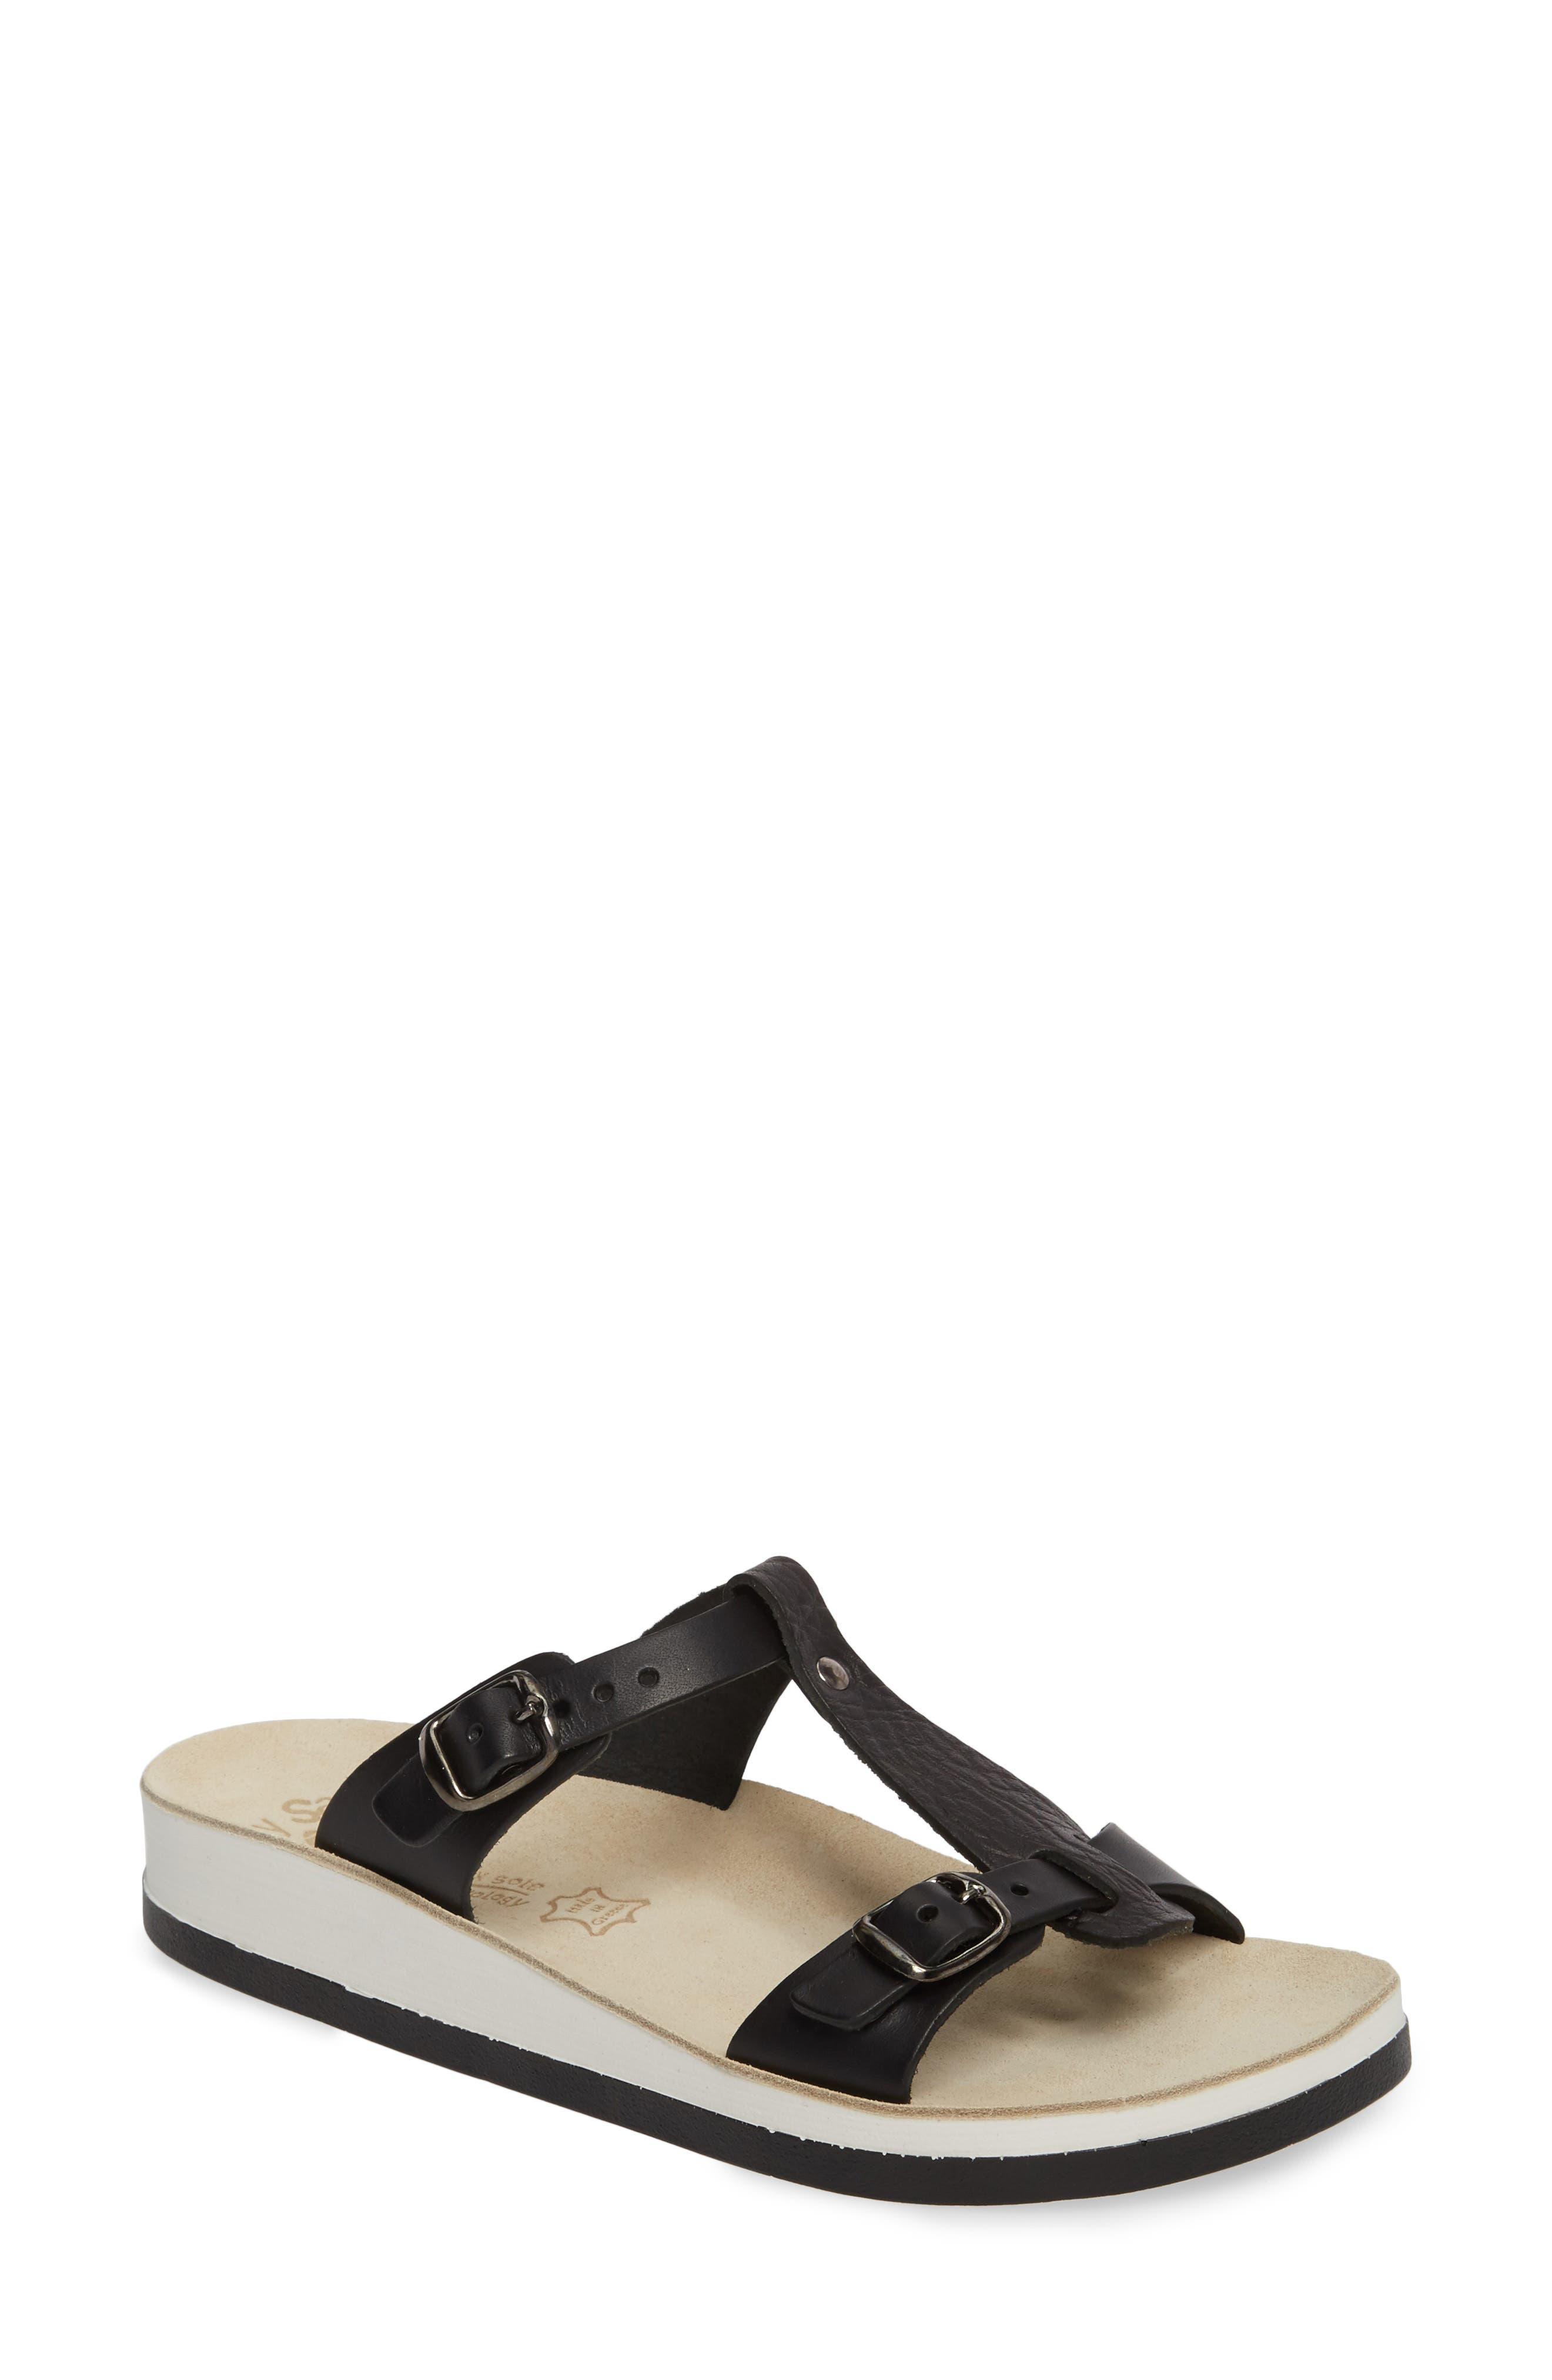 Jessamine T-Strap Sandal,                         Main,                         color, Black Volcano Leather